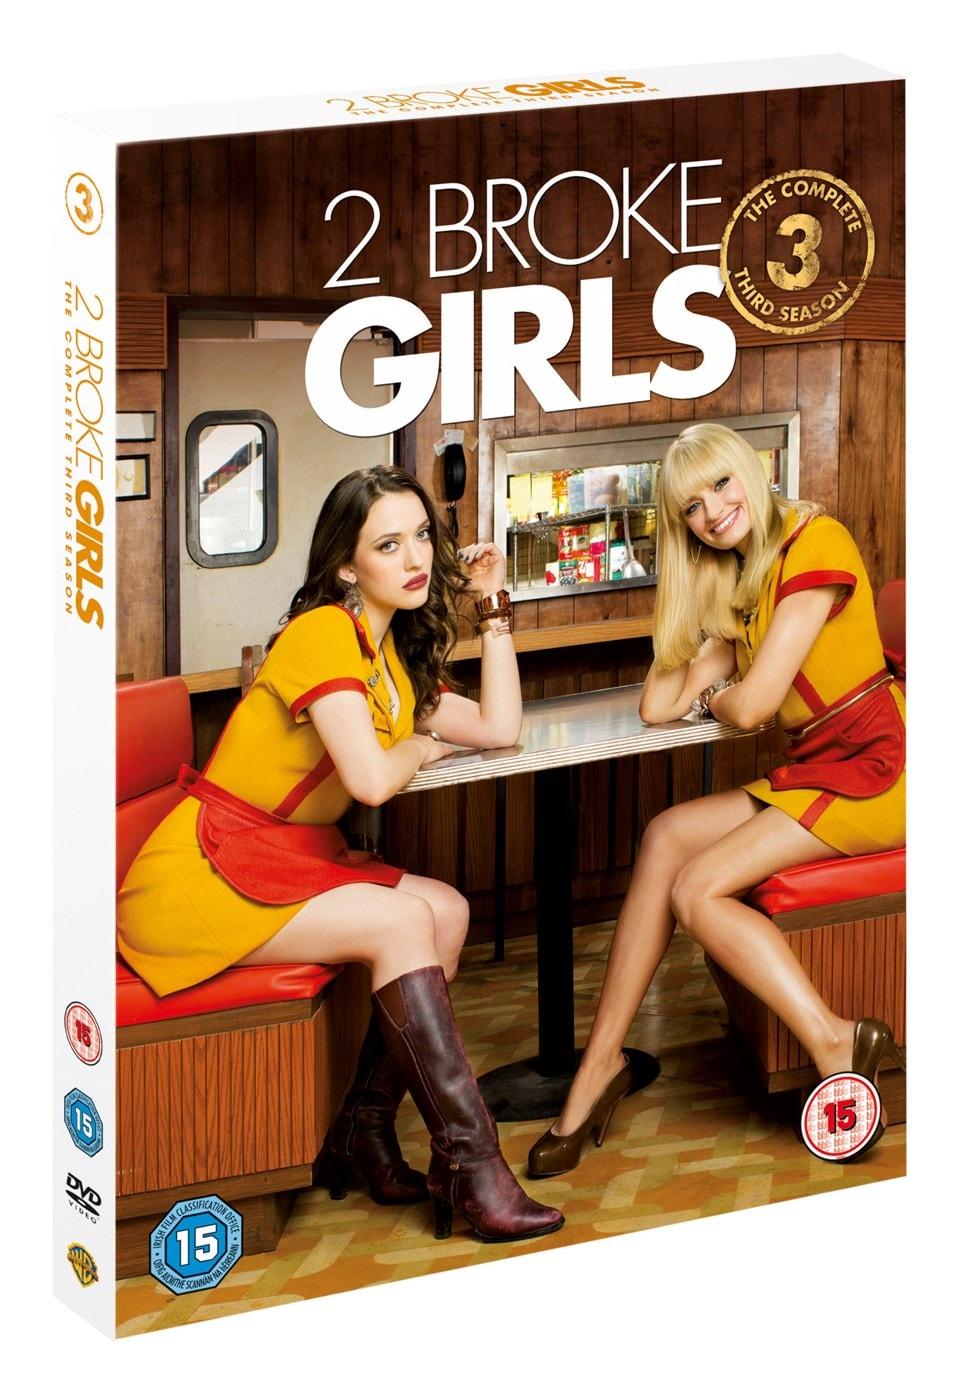 2 Broke Girls: The Complete Third Season - 2